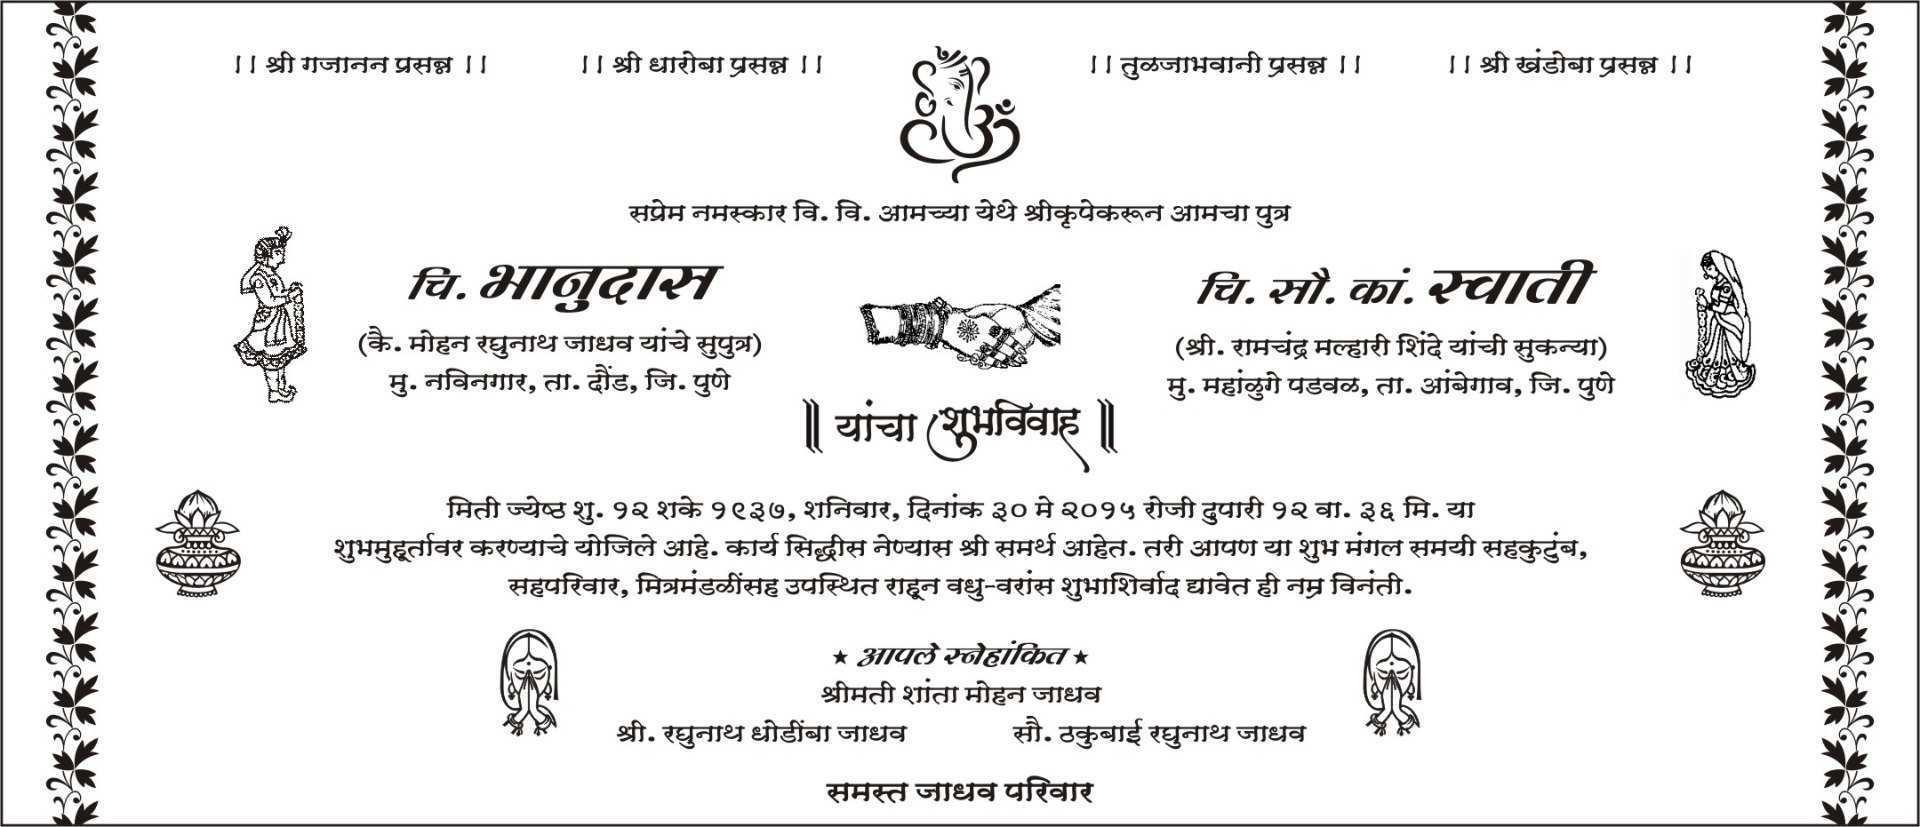 4 Standard Invitation Card Sample In Urdu With Stunning Design